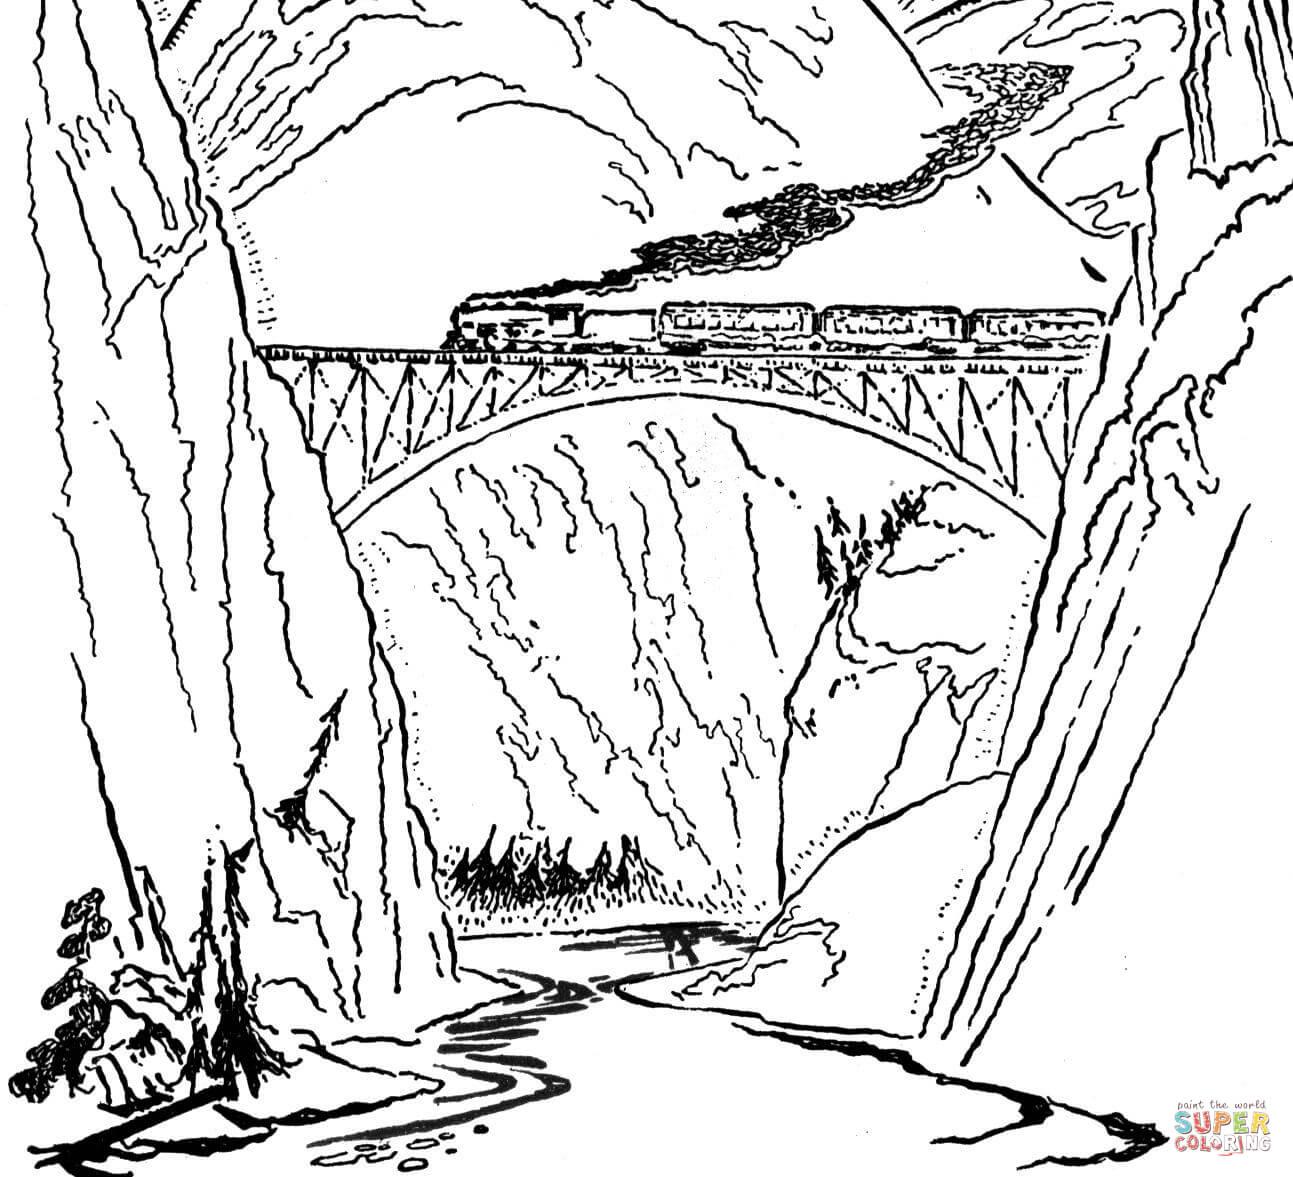 Ny Bridges Coloring Sheets - Worksheet & Coloring Pages